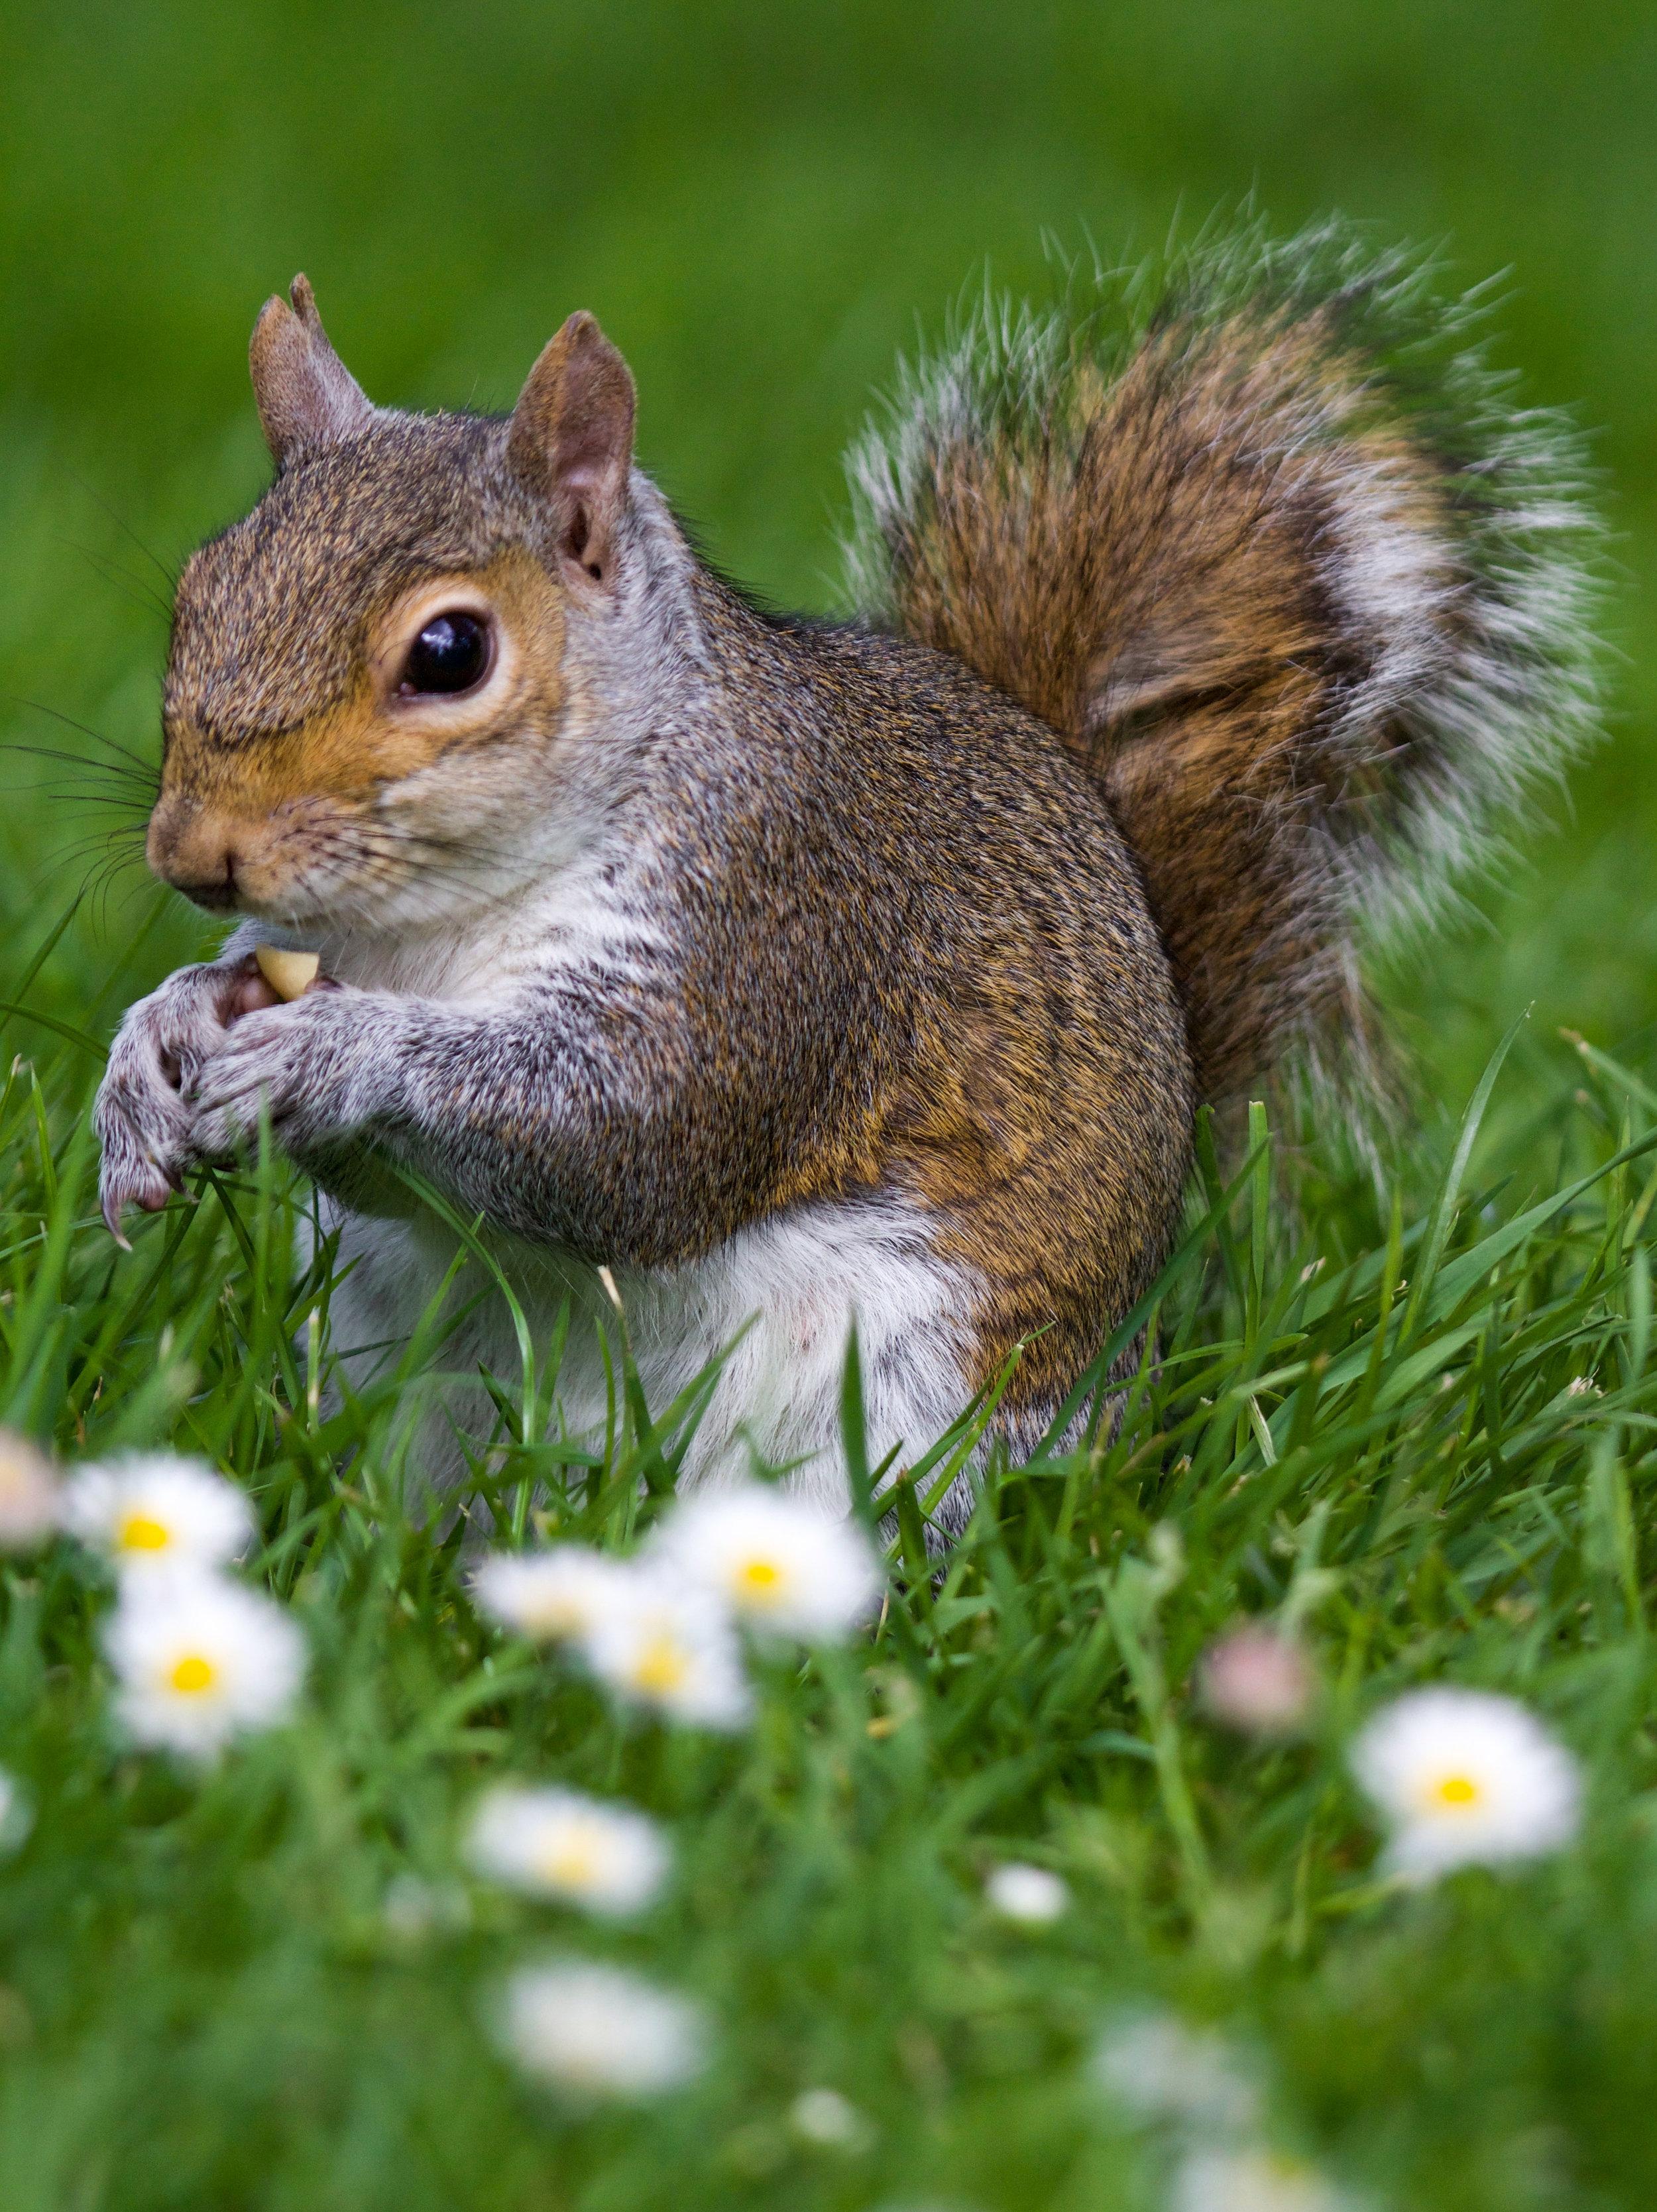 eastern gray squirrel eating hyde park london (1 of 1).jpg